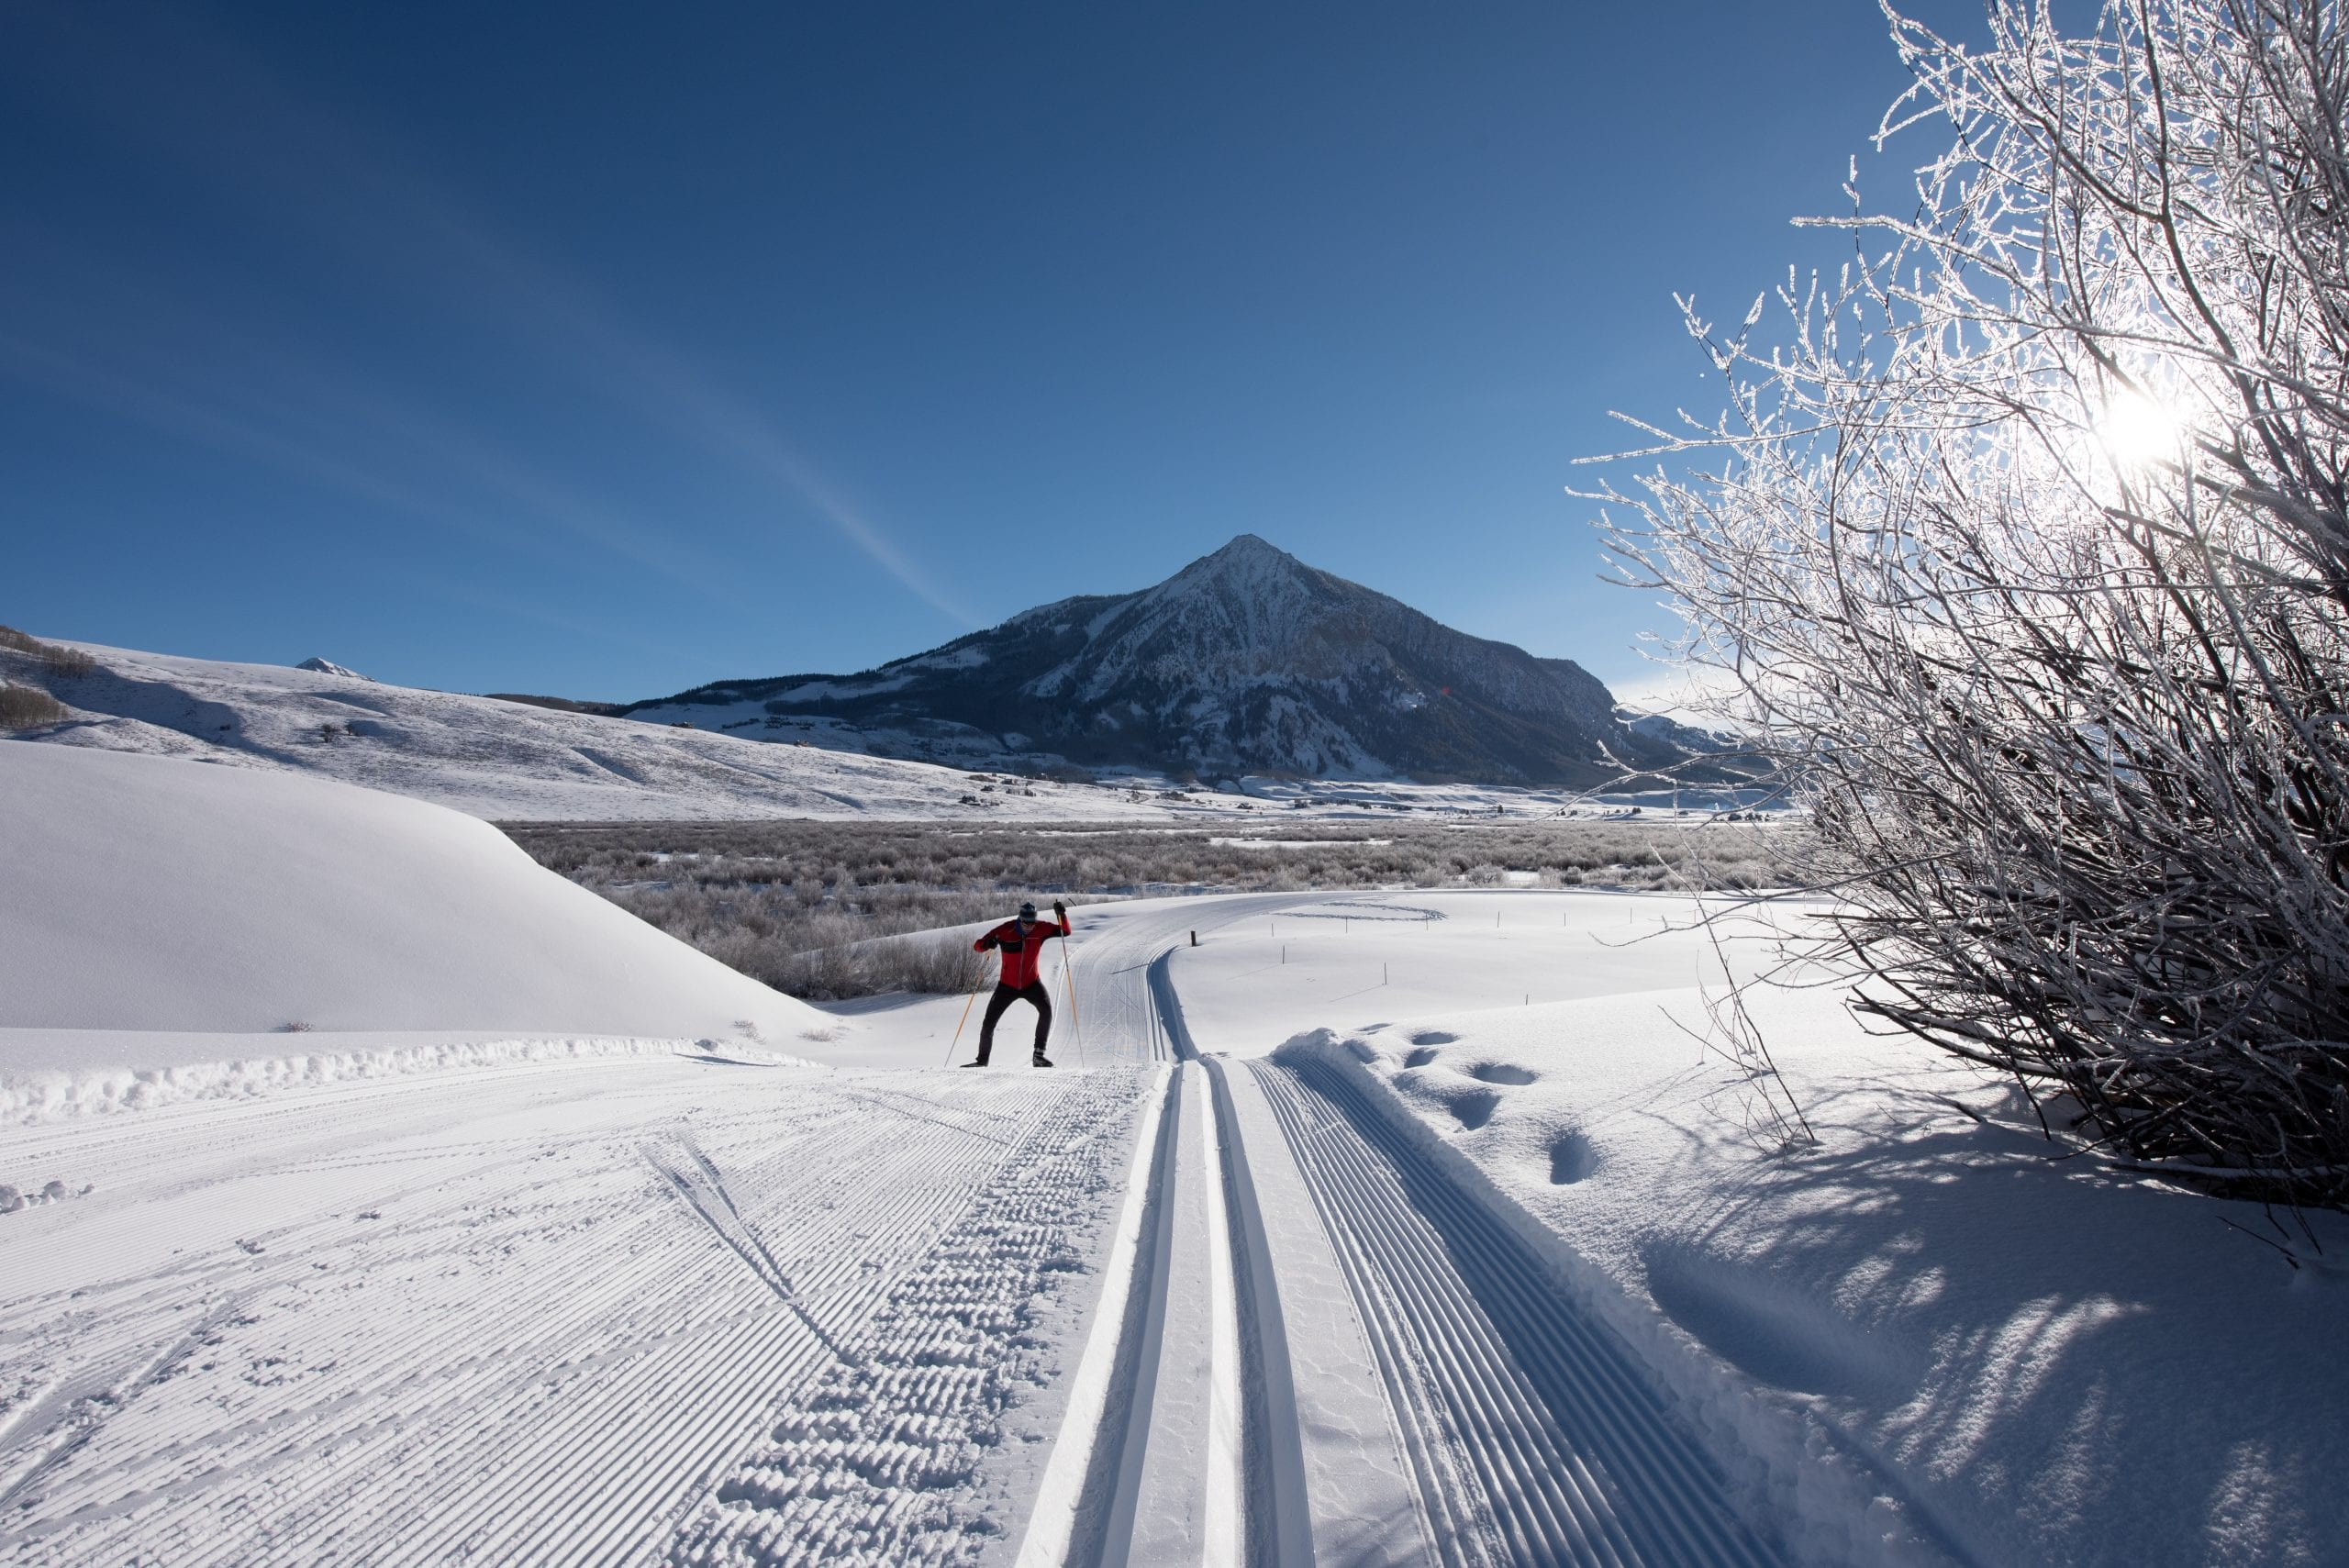 Skate skier with Mt Crested Butte backdrop